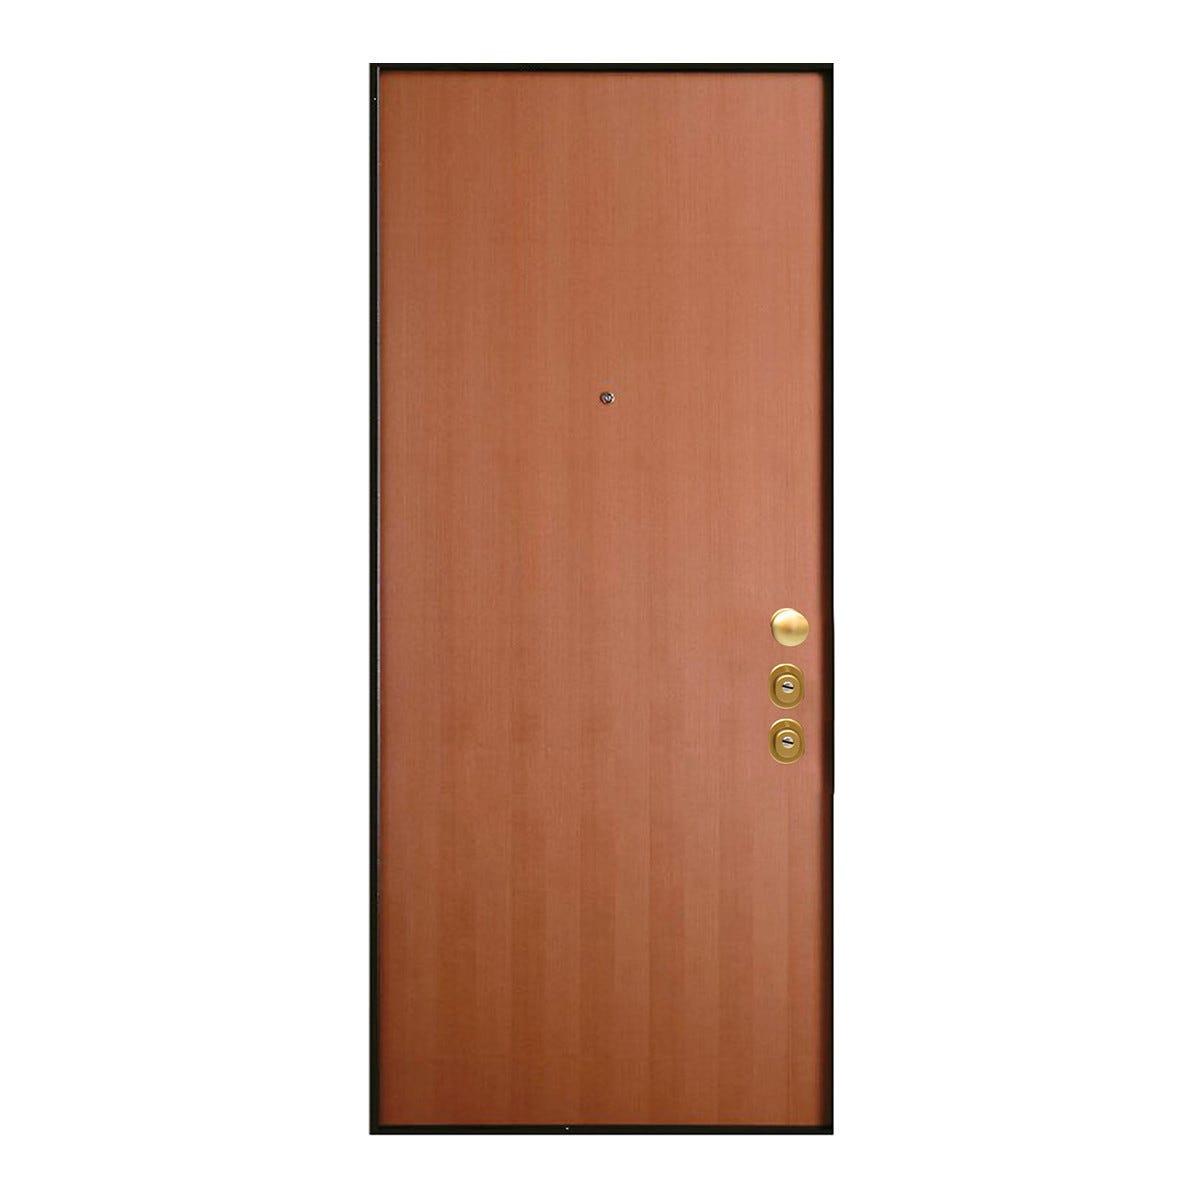 Porta Blindata Wood Doppio Cilindro Apertura Spinta A Destra 210x90 Cm (Hxl)